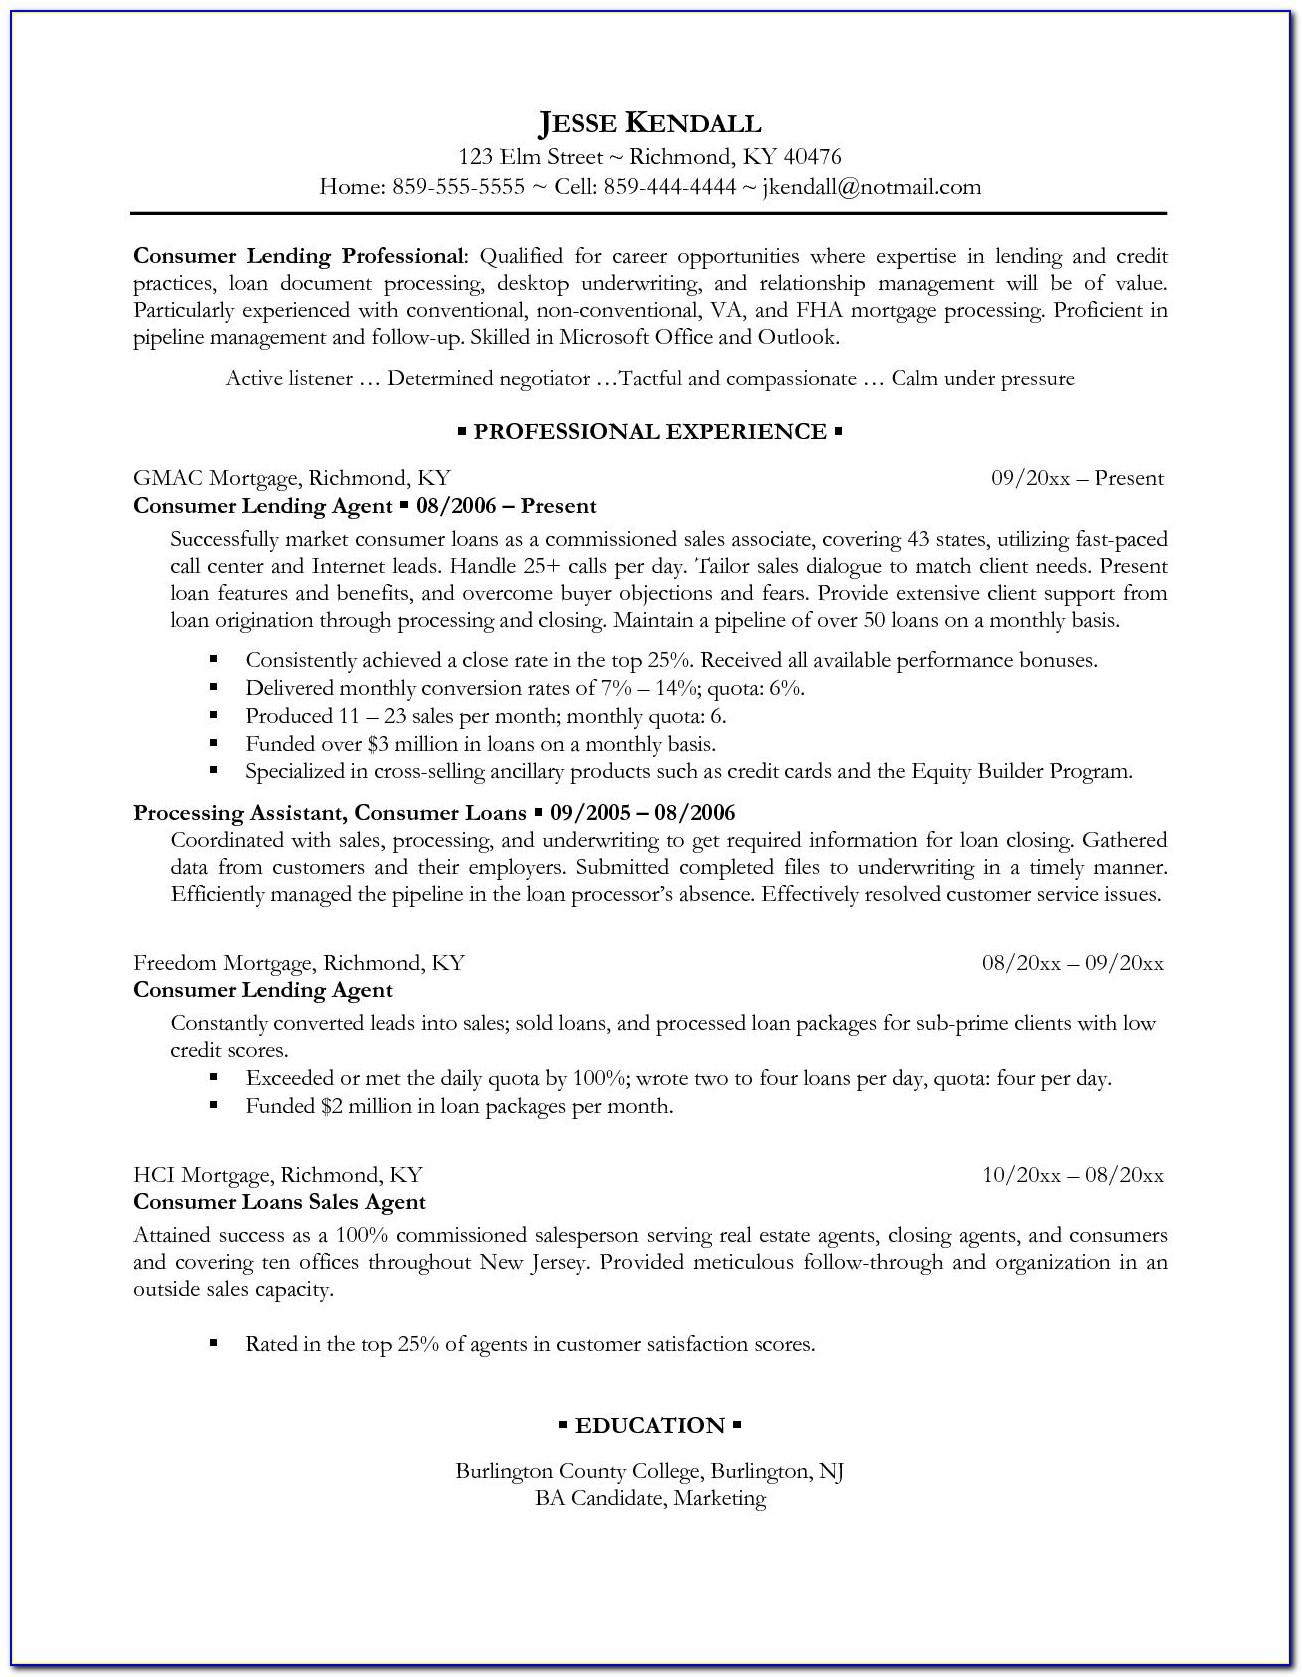 Professional Resume Writing Services Richmond Va Job Resume Samples